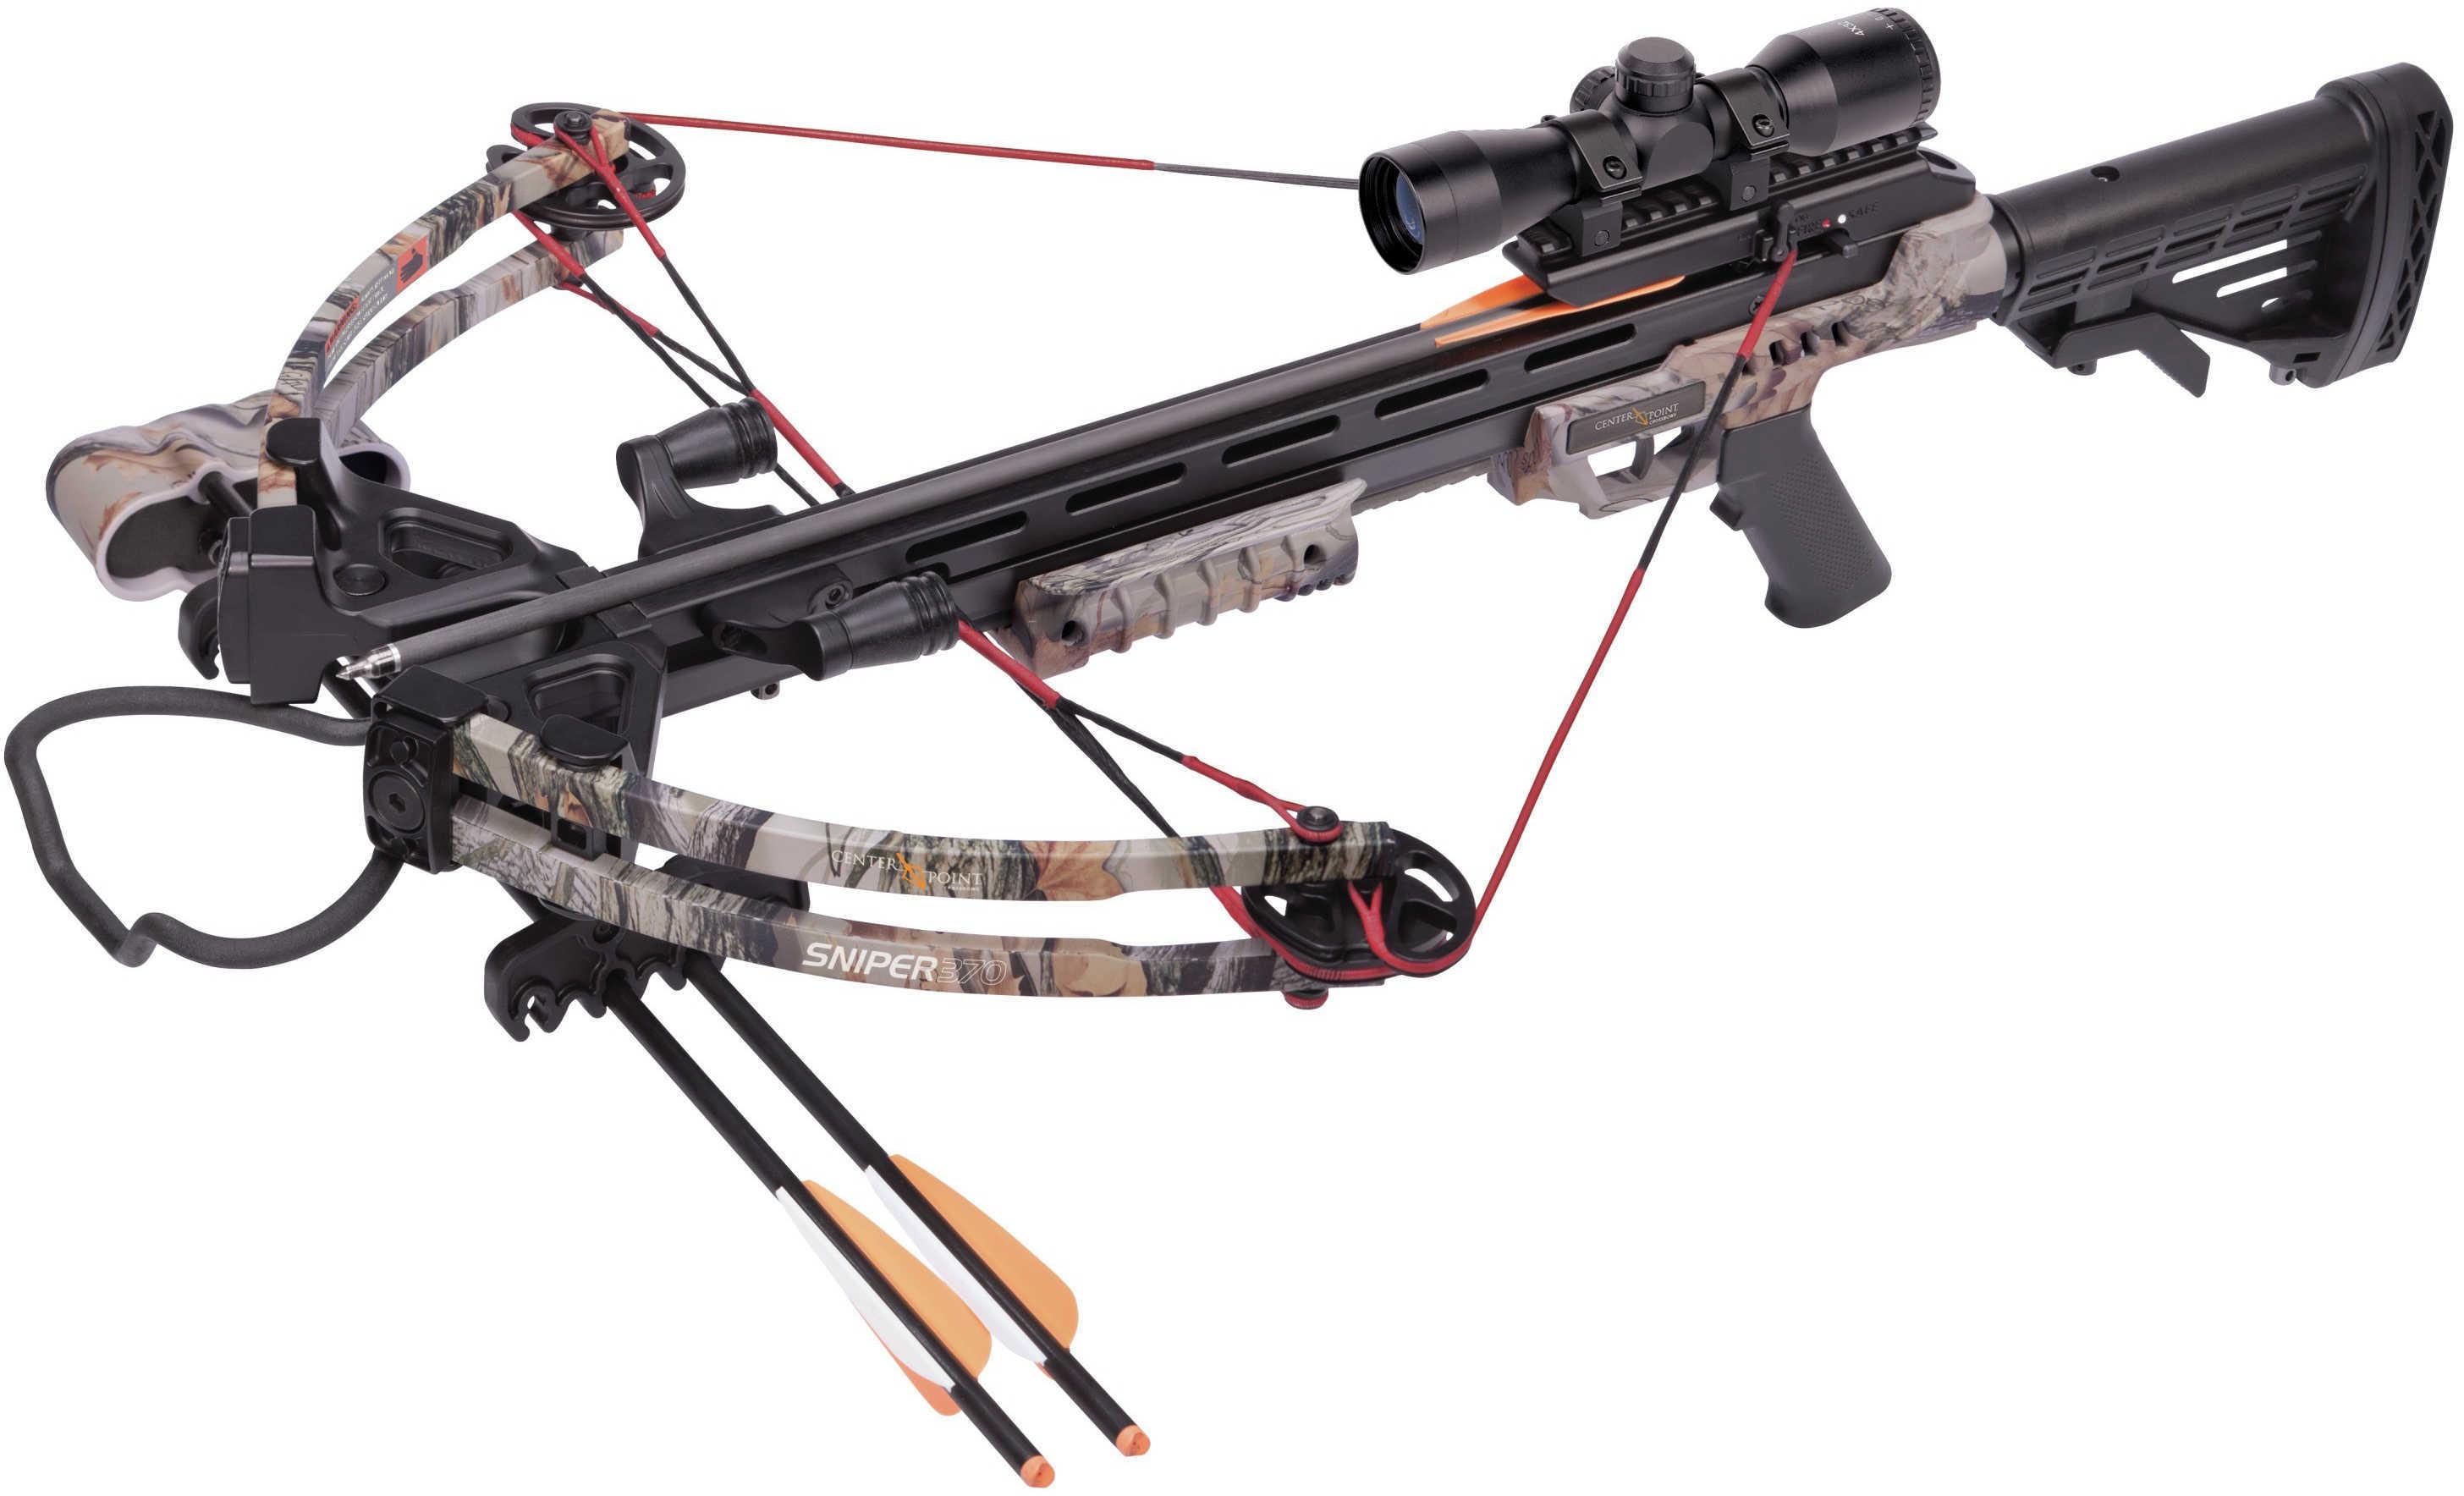 Crosman Sniper 370 Crossbow Package - Camo Md: AXCS185CK